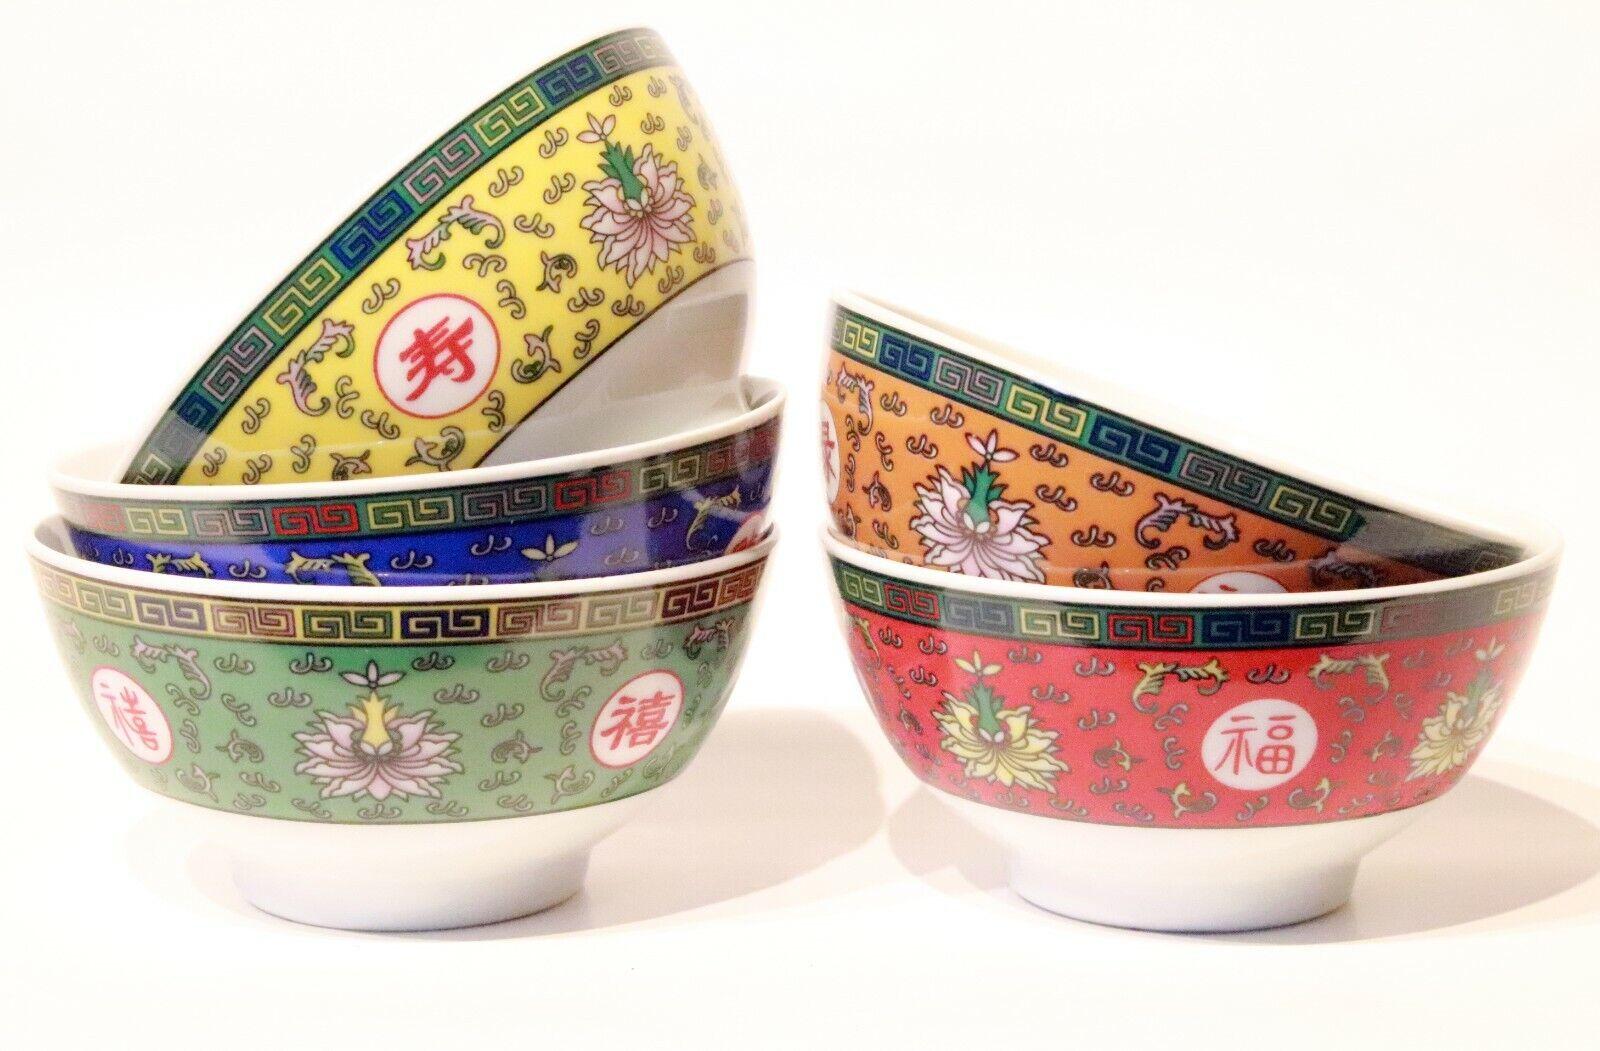 Asiatisches Schalen Set 5-teilig bunt Reisschale Nudel Suppe Schüssel chinesisch